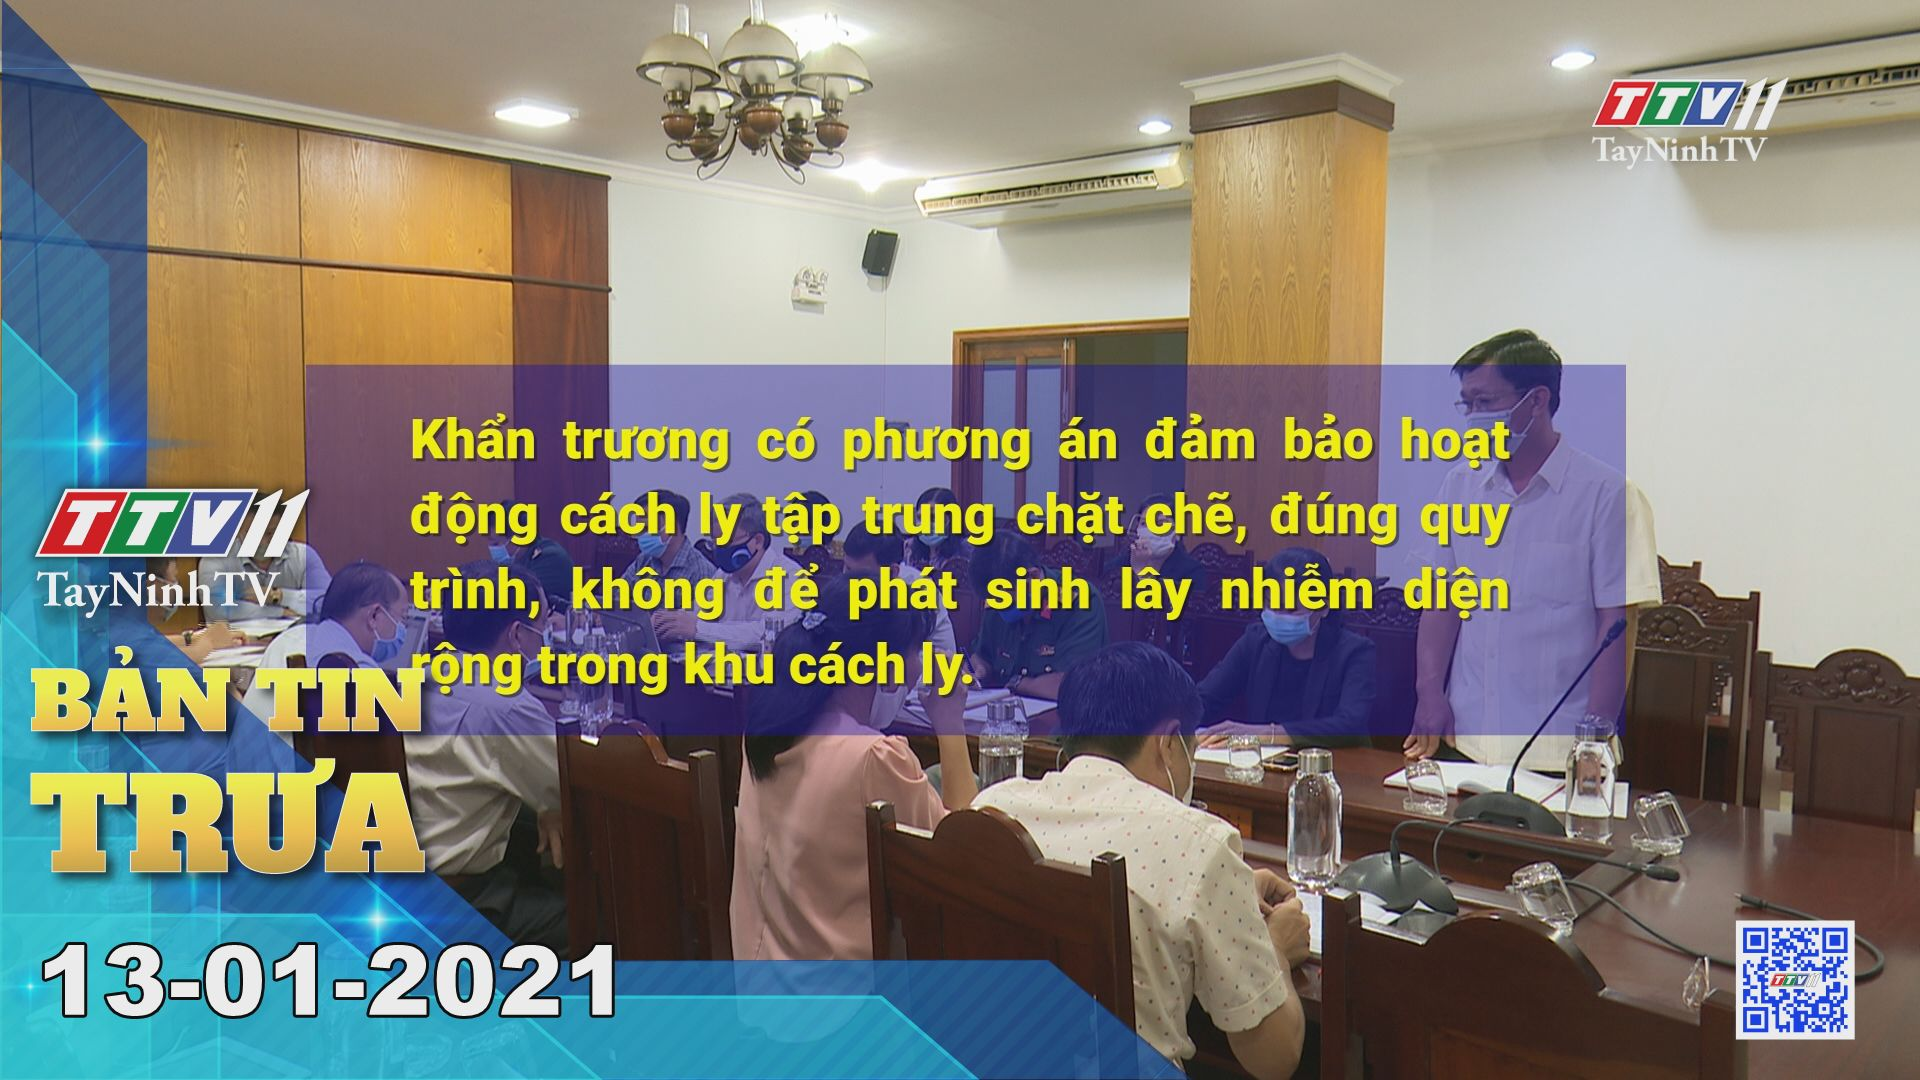 Bản tin trưa 13-01-2021 | Tin tức hôm nay | TayNinhTV